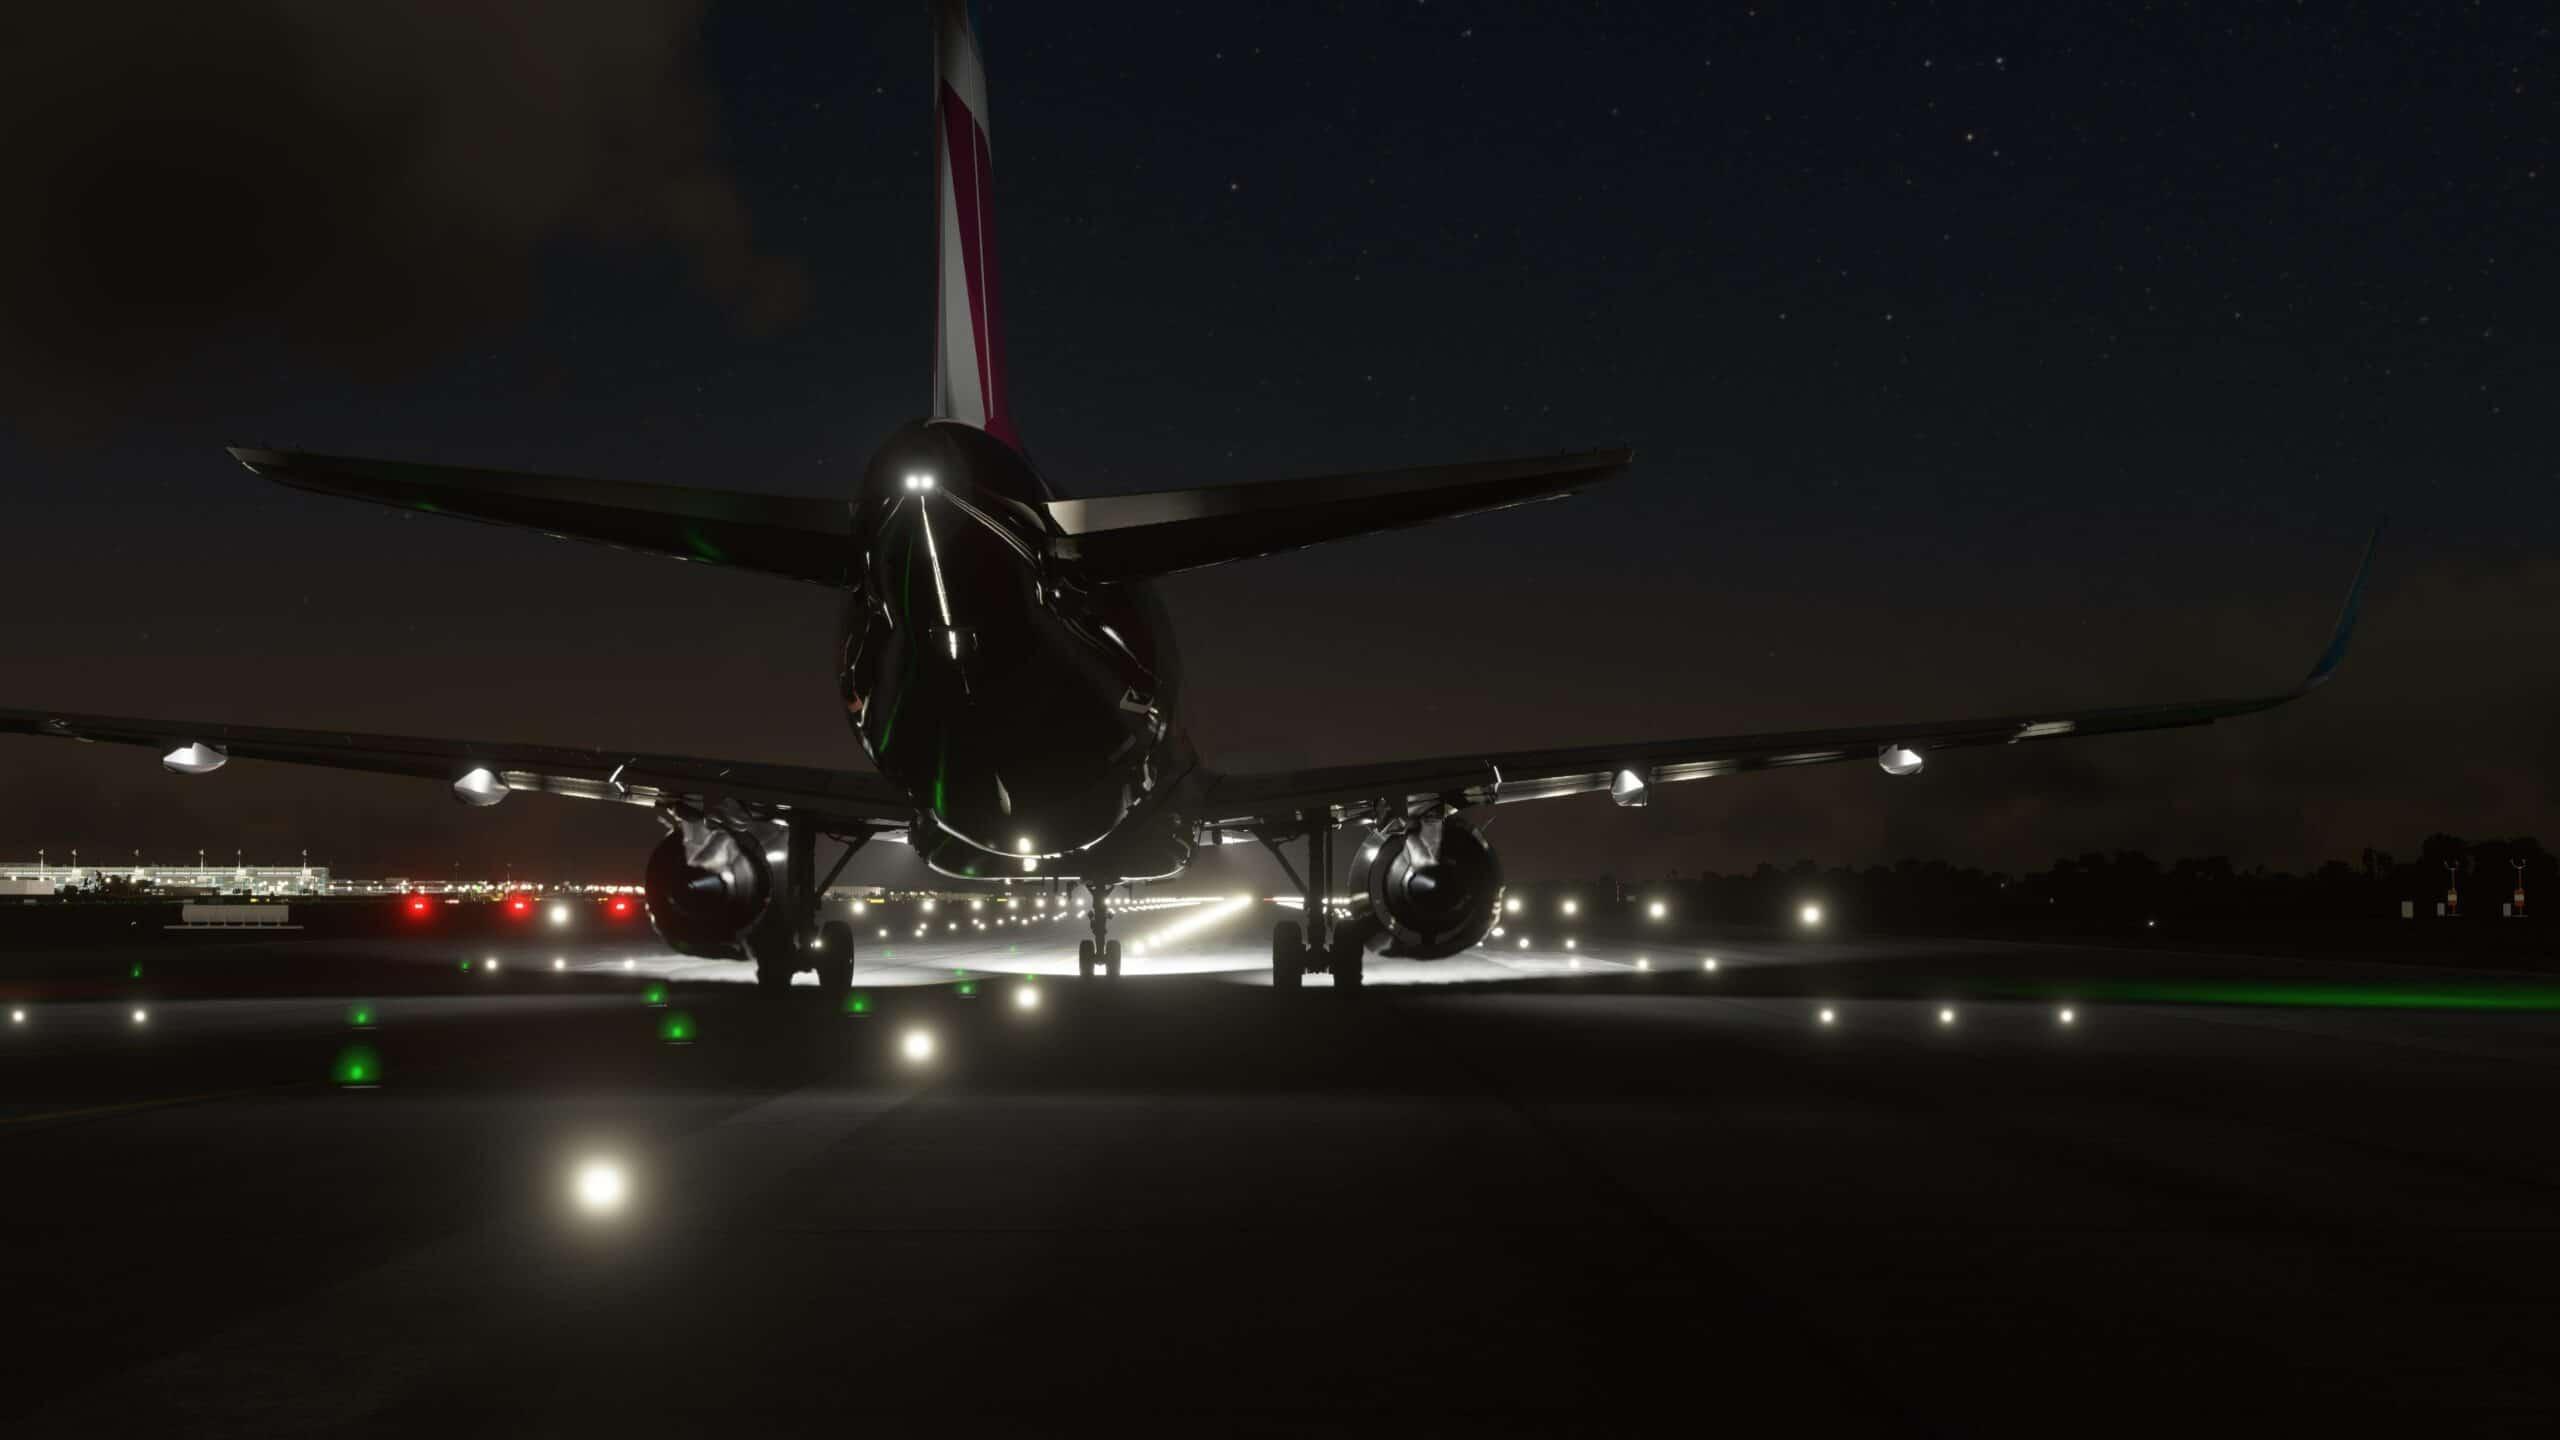 FlightSimulator_8BCH5QQp8d